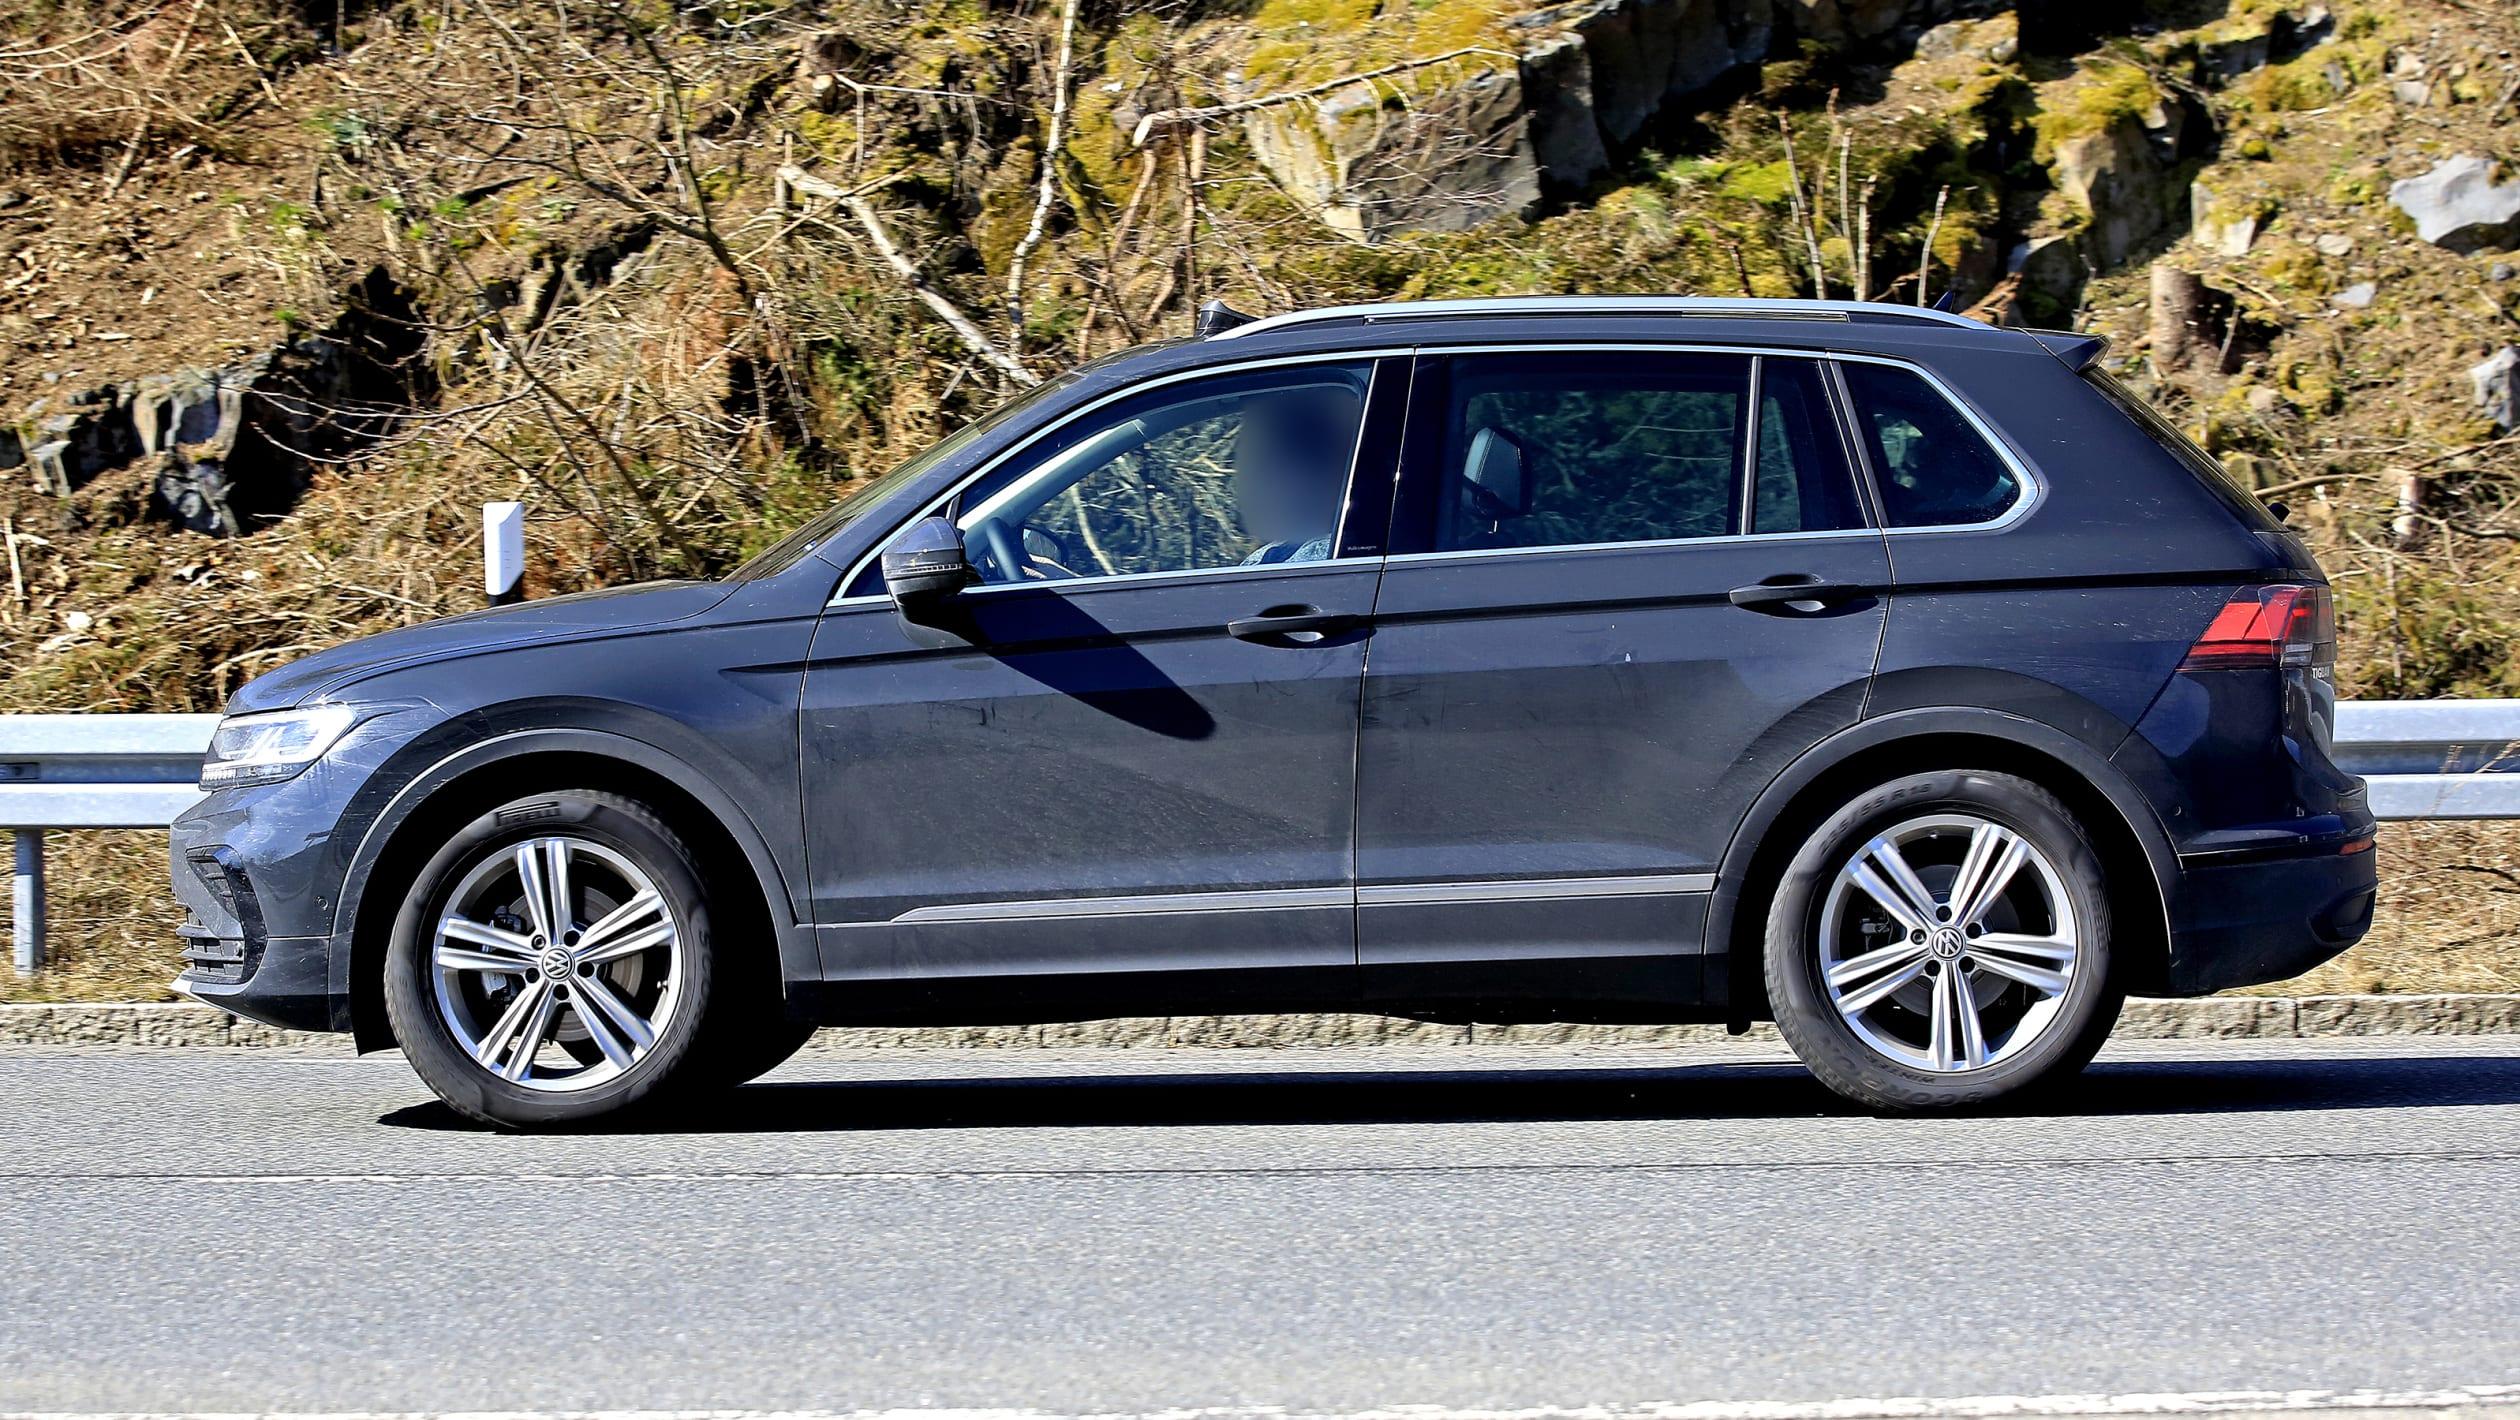 Volkswagen Tiguan 2020 facelift spy shots and teaser ...